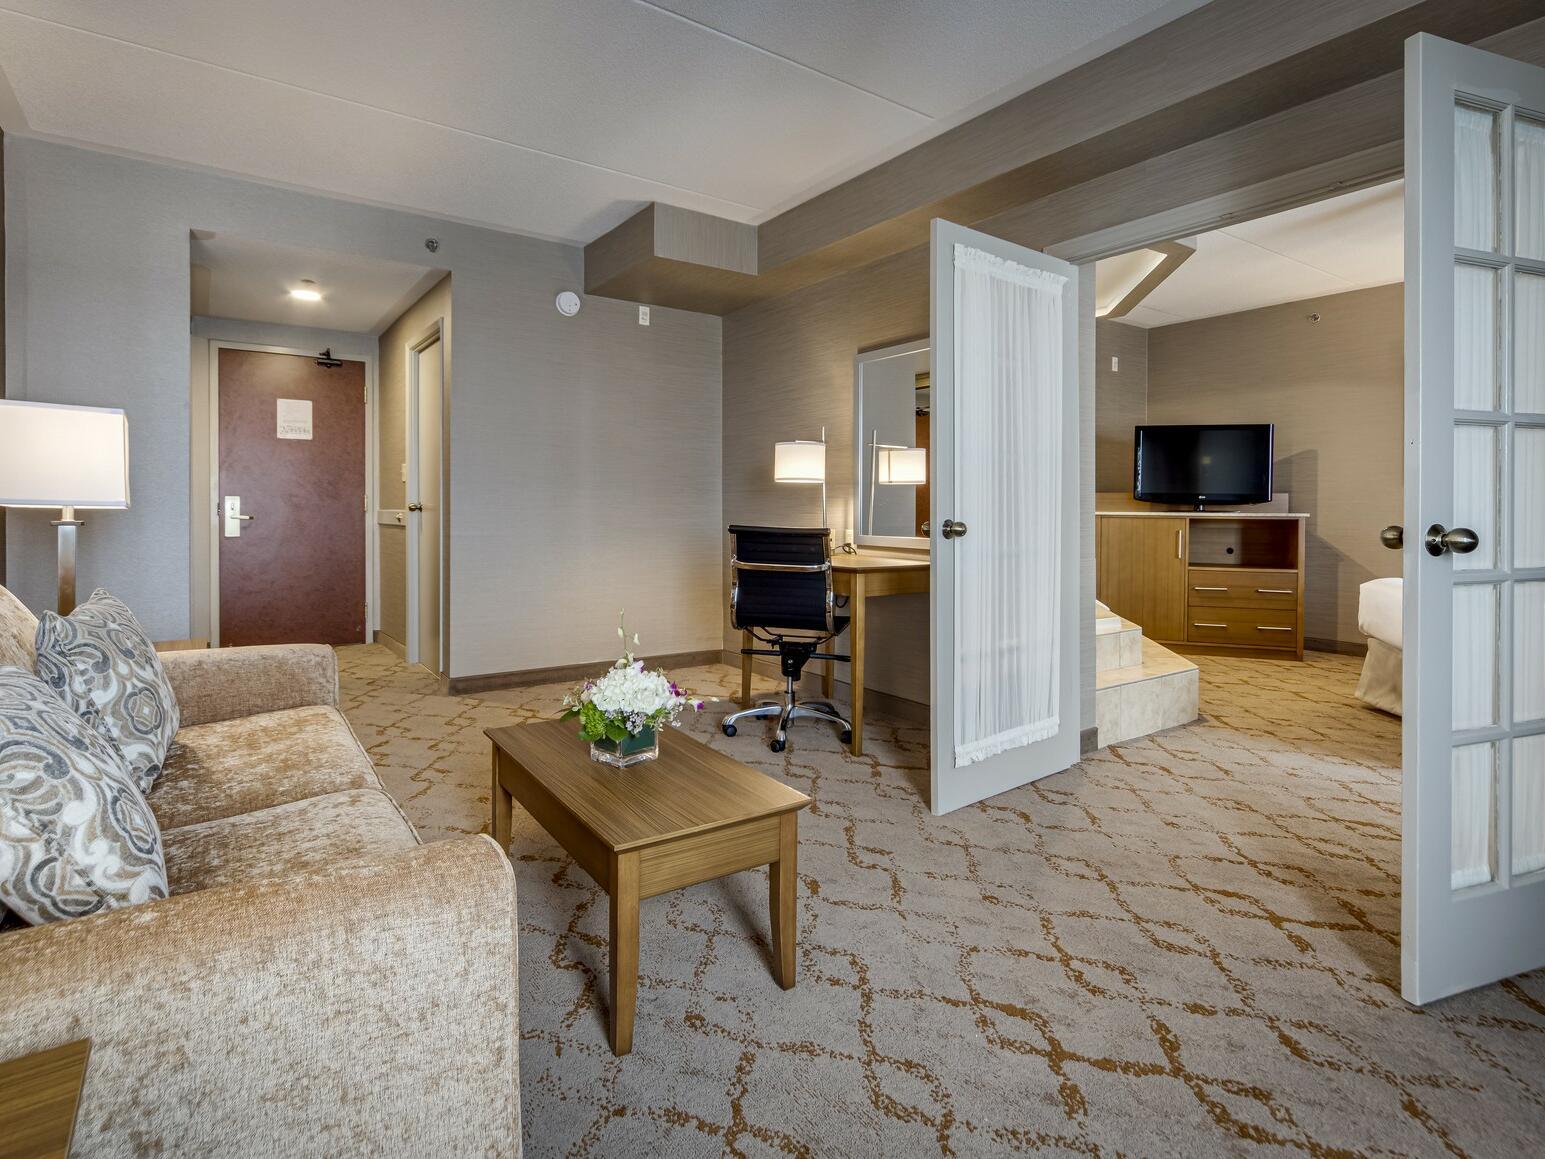 Deluxe Queen Jacuzzi Suite lobby at Monte Carlo Inn Vaughan Suites